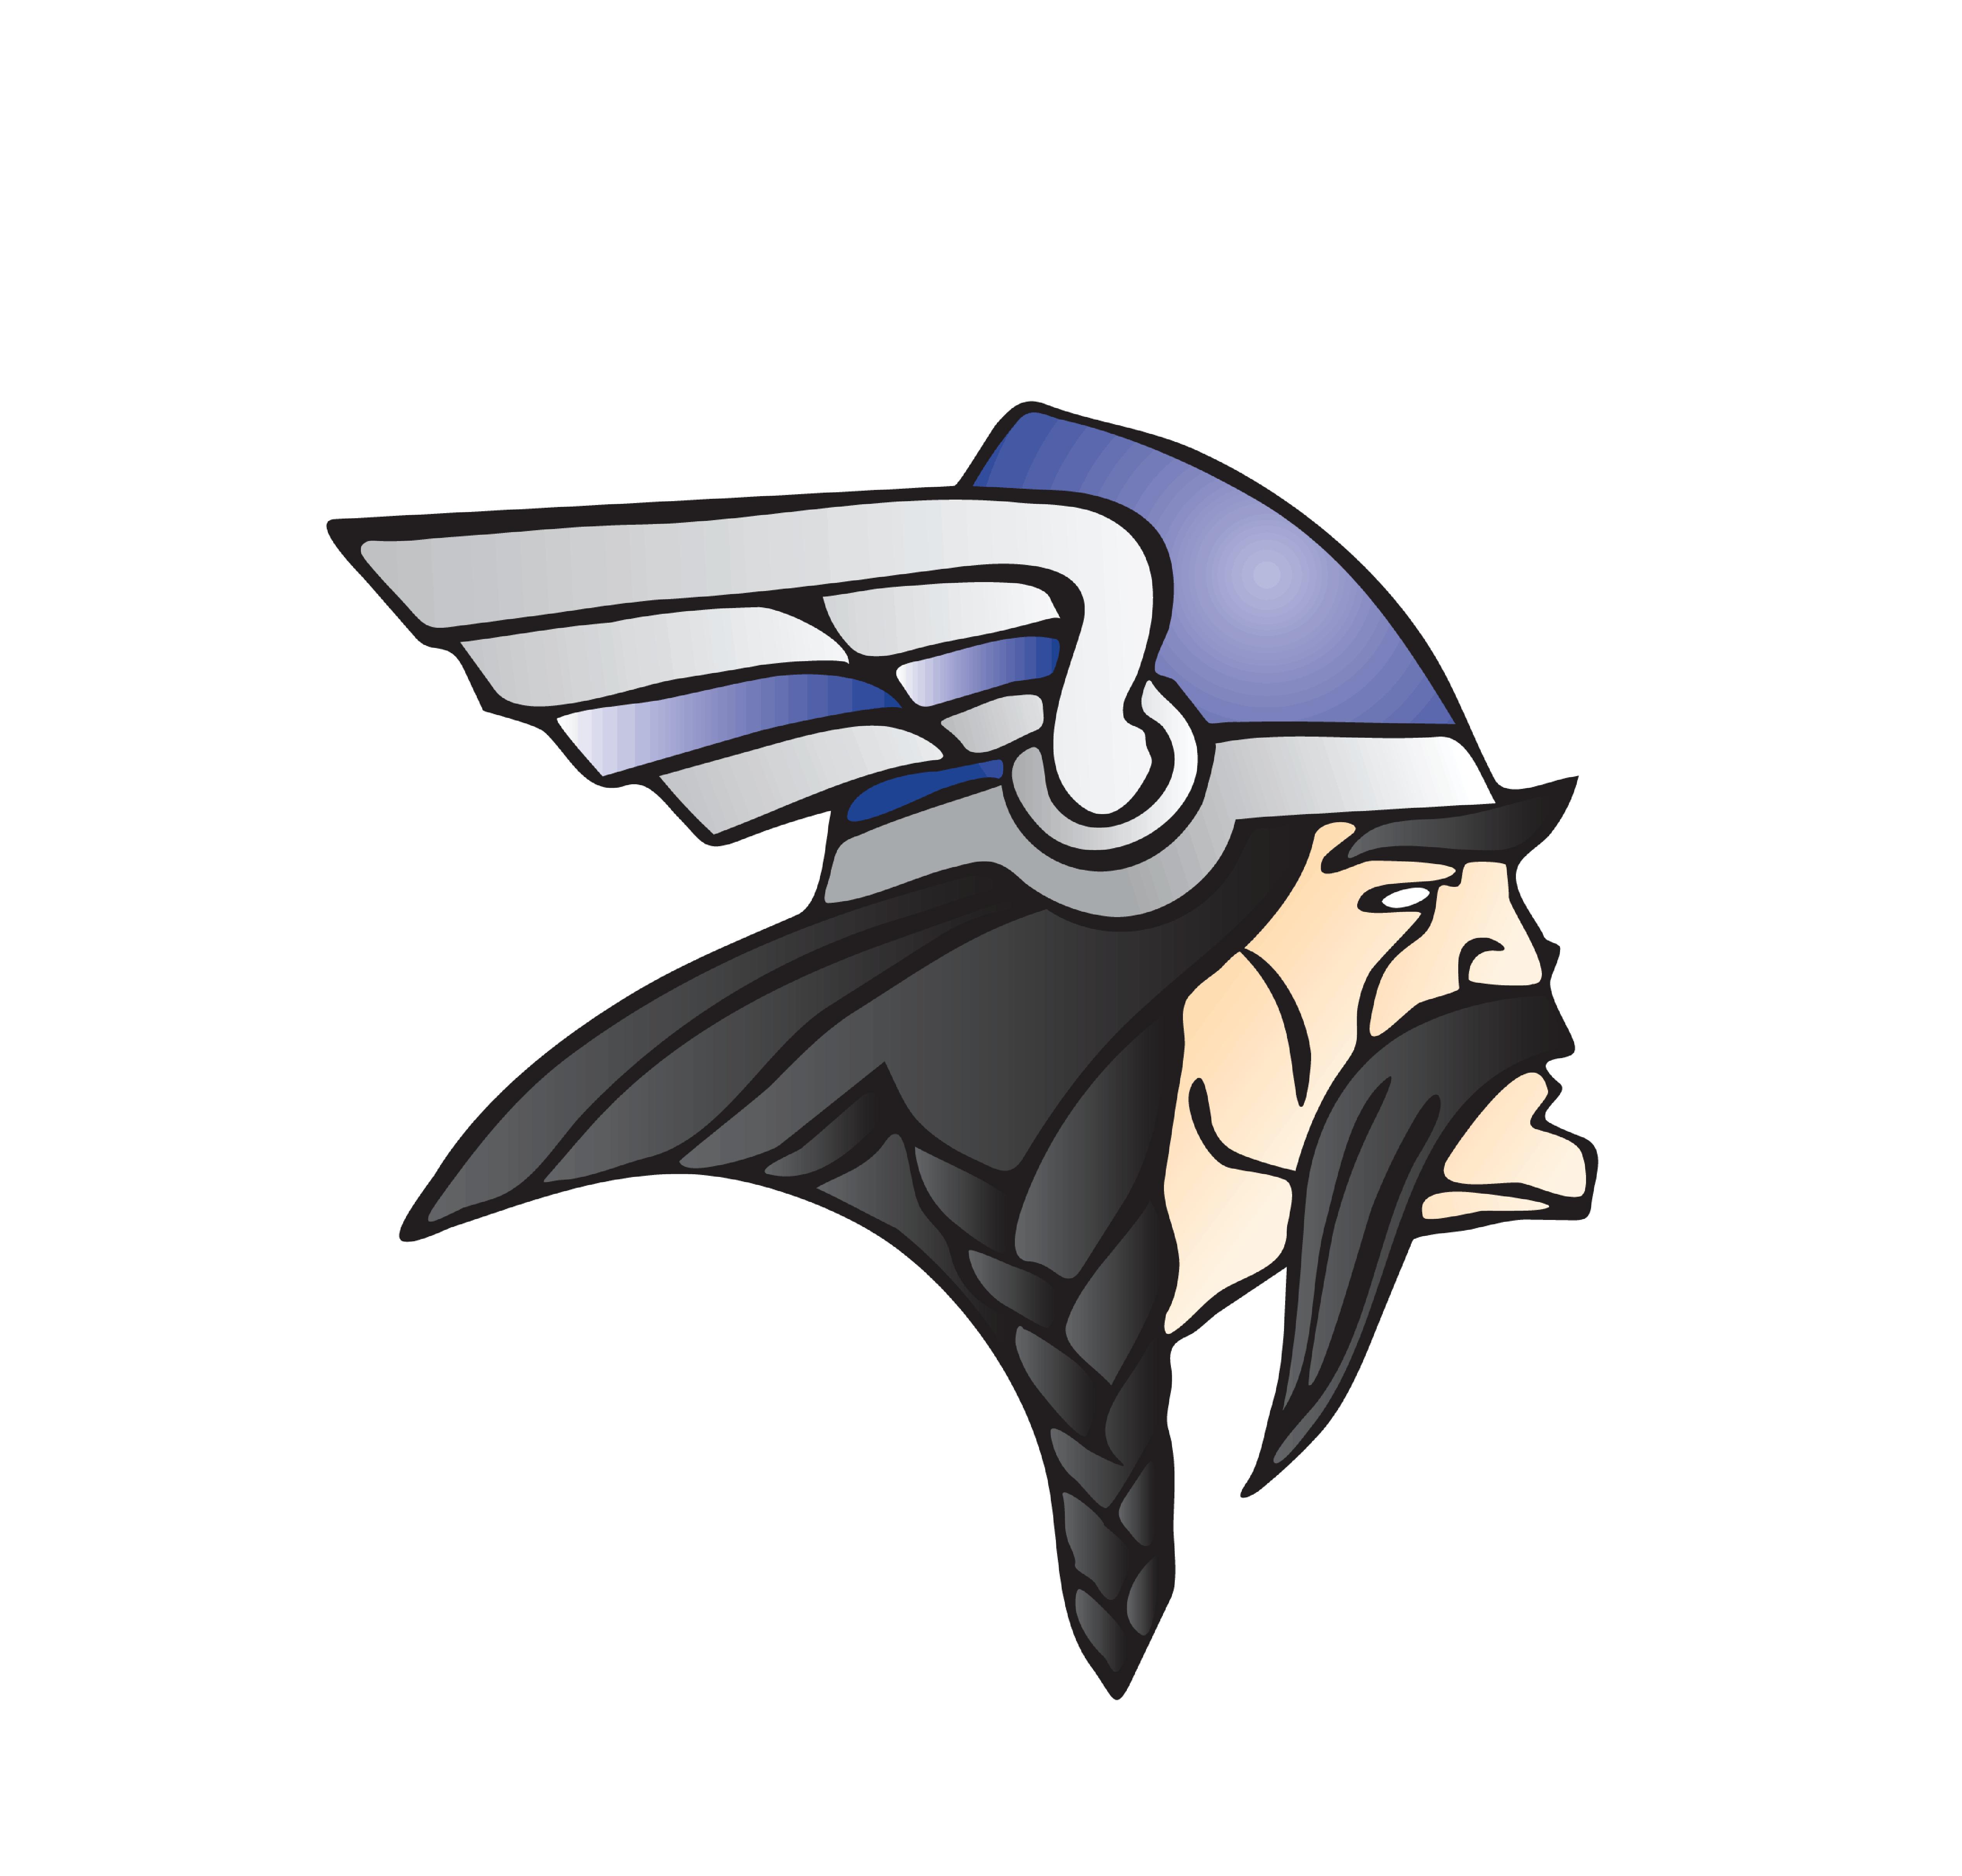 Desk clipart high school counselor. Hs nimitz homepage logo